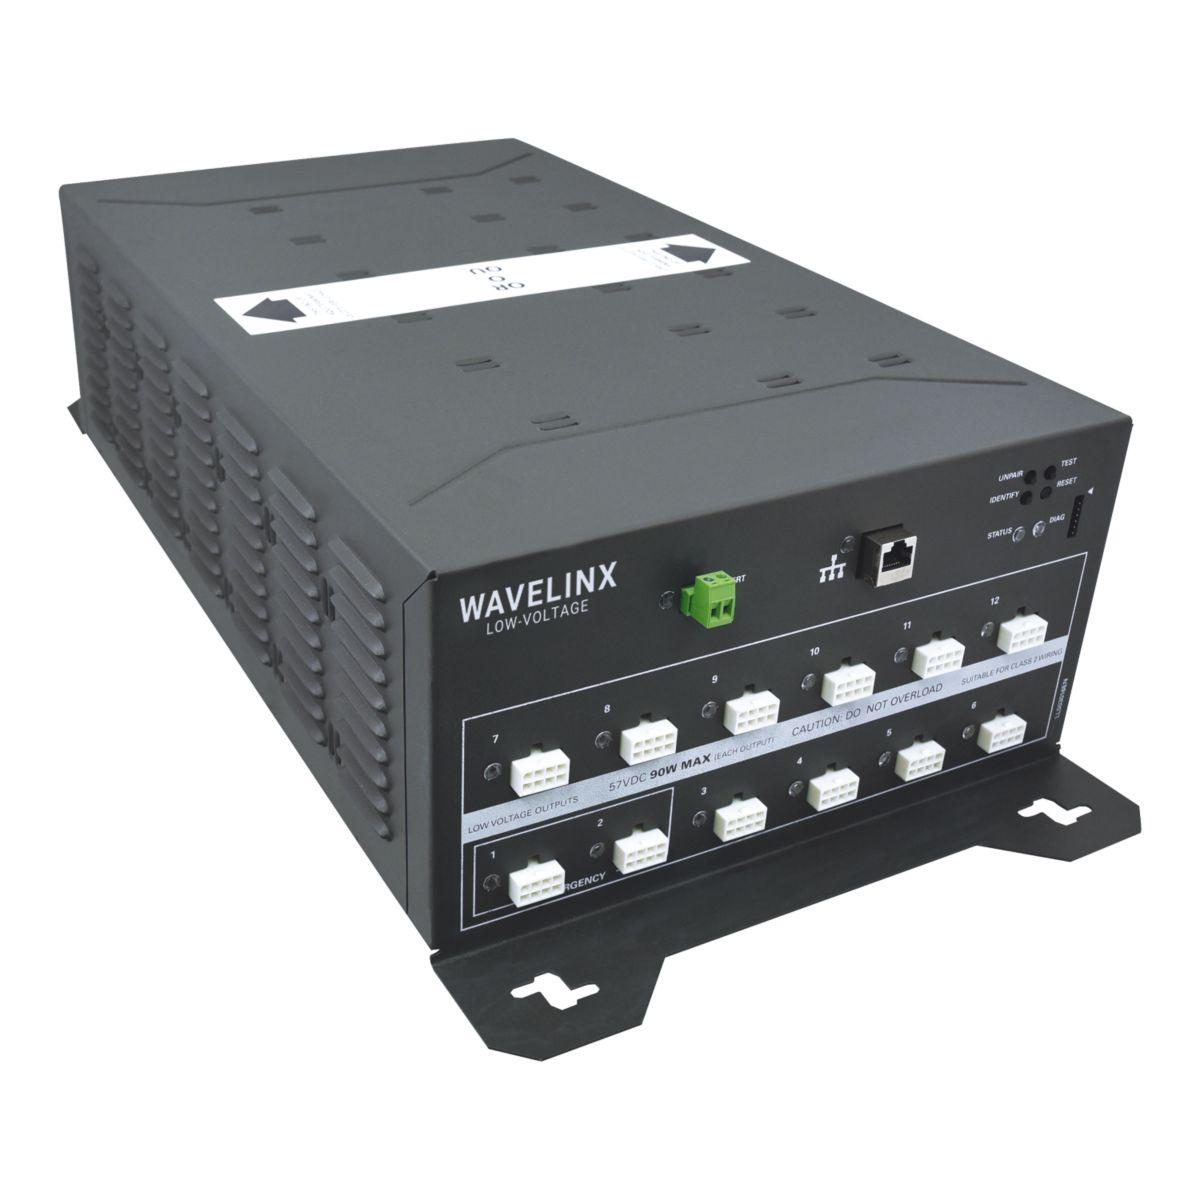 WaveLinx Low-Voltage 1200W Power Module